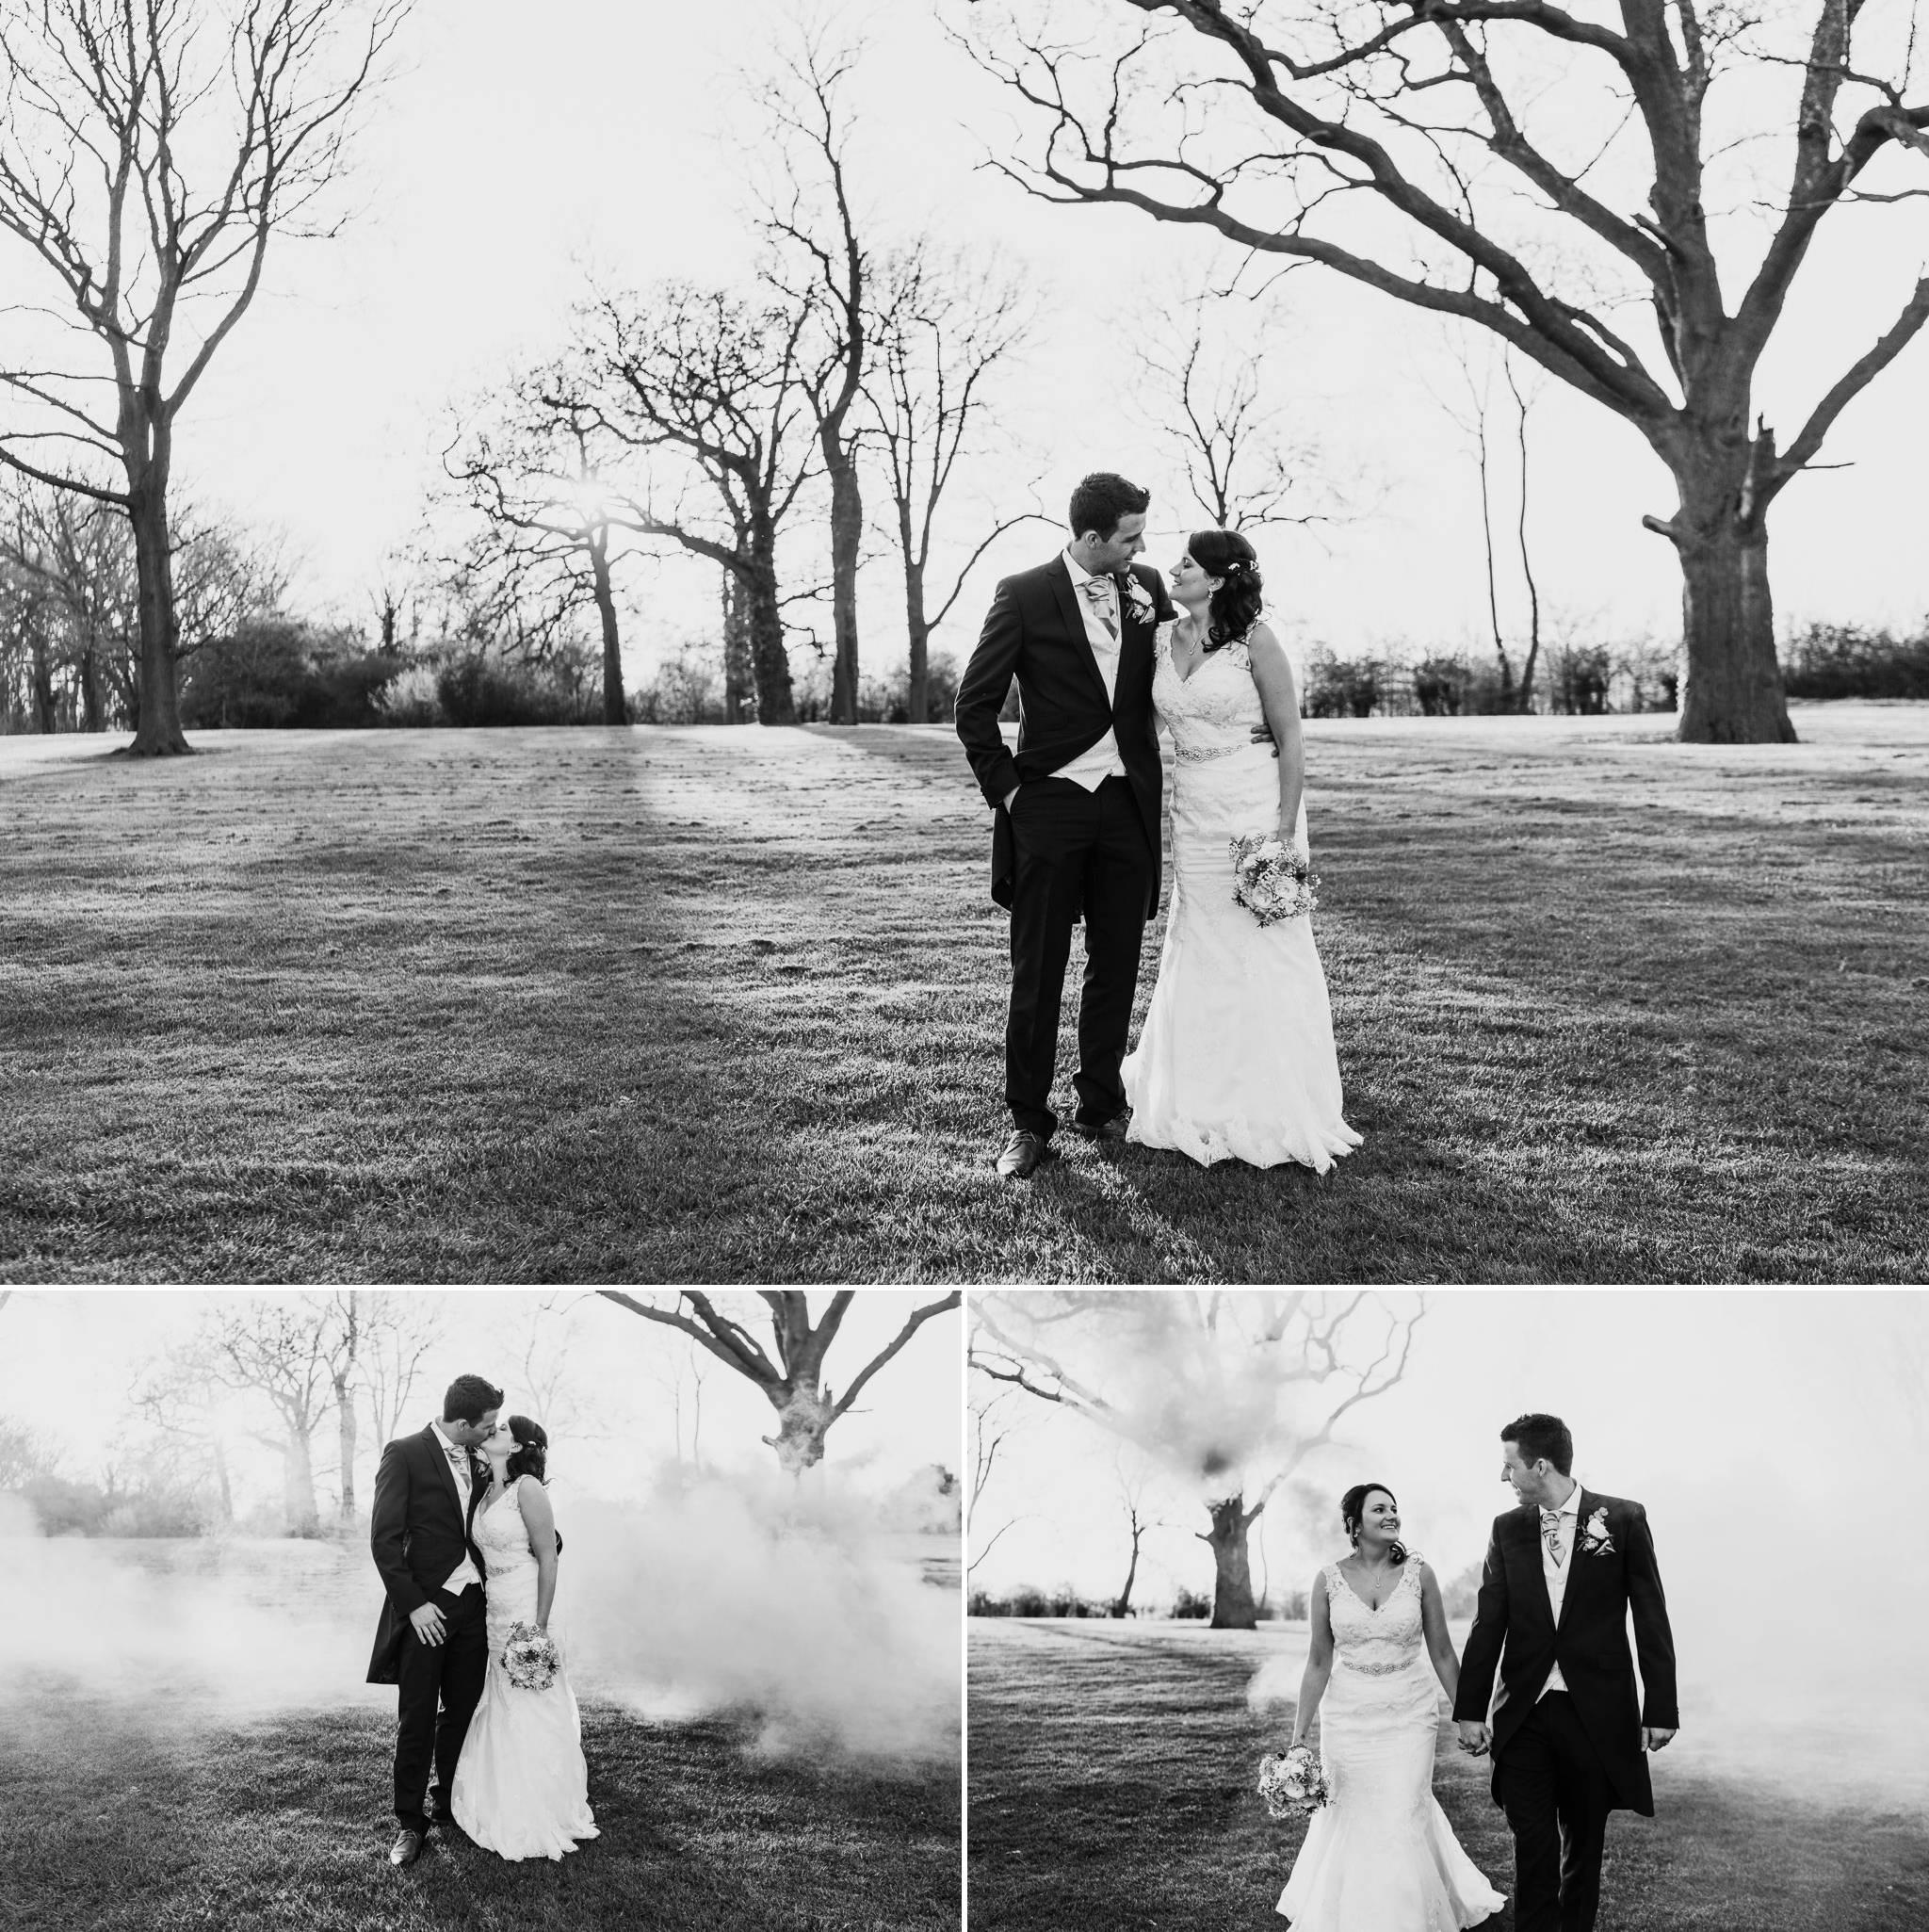 stubton-hall-wedding-photography 18.jpg